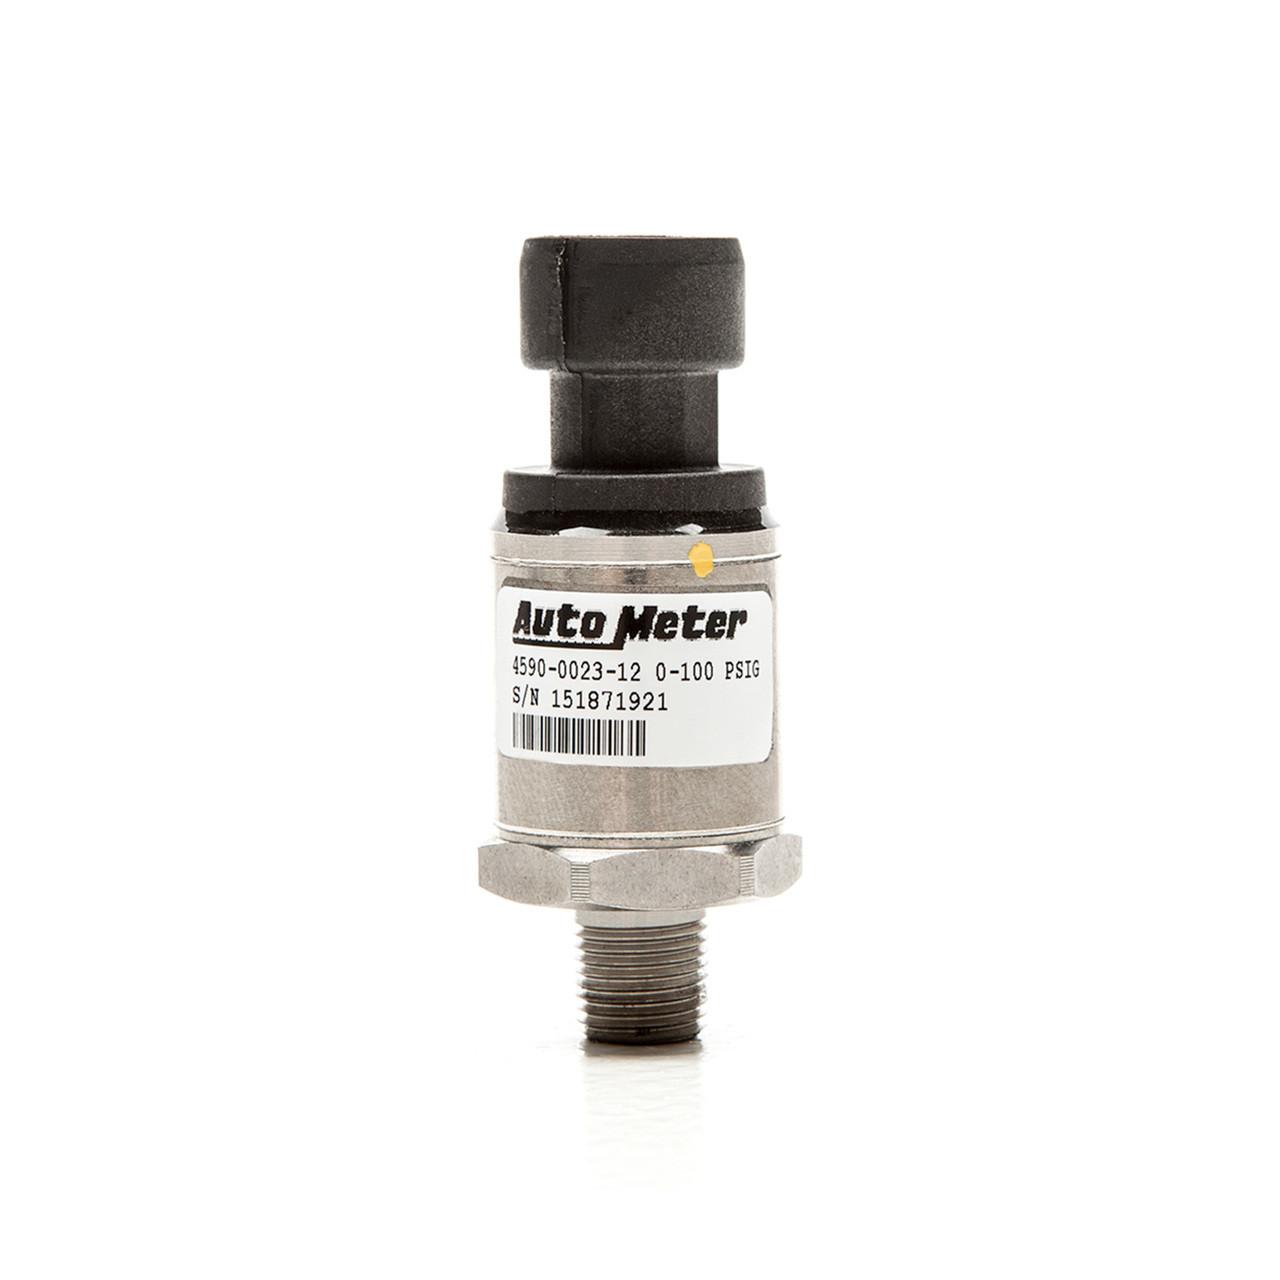 COBB Subaru Fuel Pressor Sensor Kit - 2015+ STI